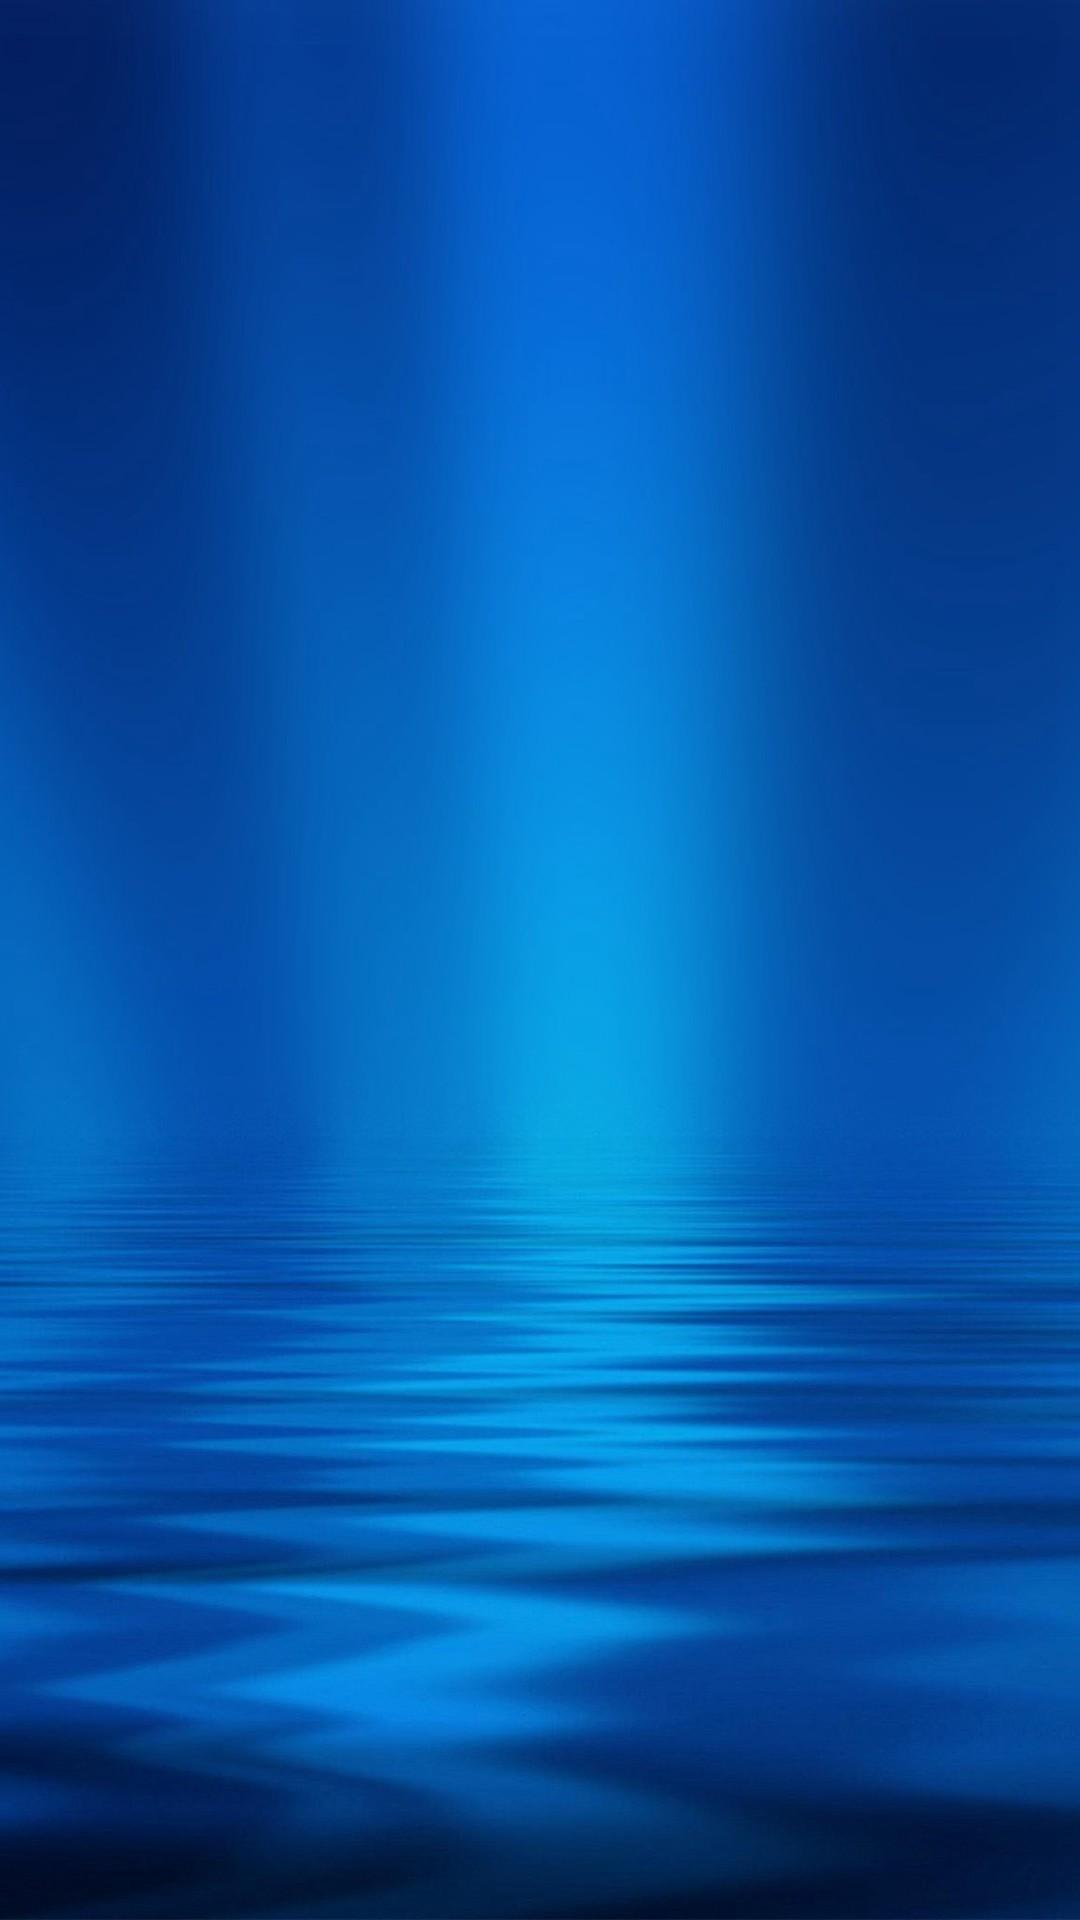 Sea Blue Ripple Pattern iPhone 6 wallpaper